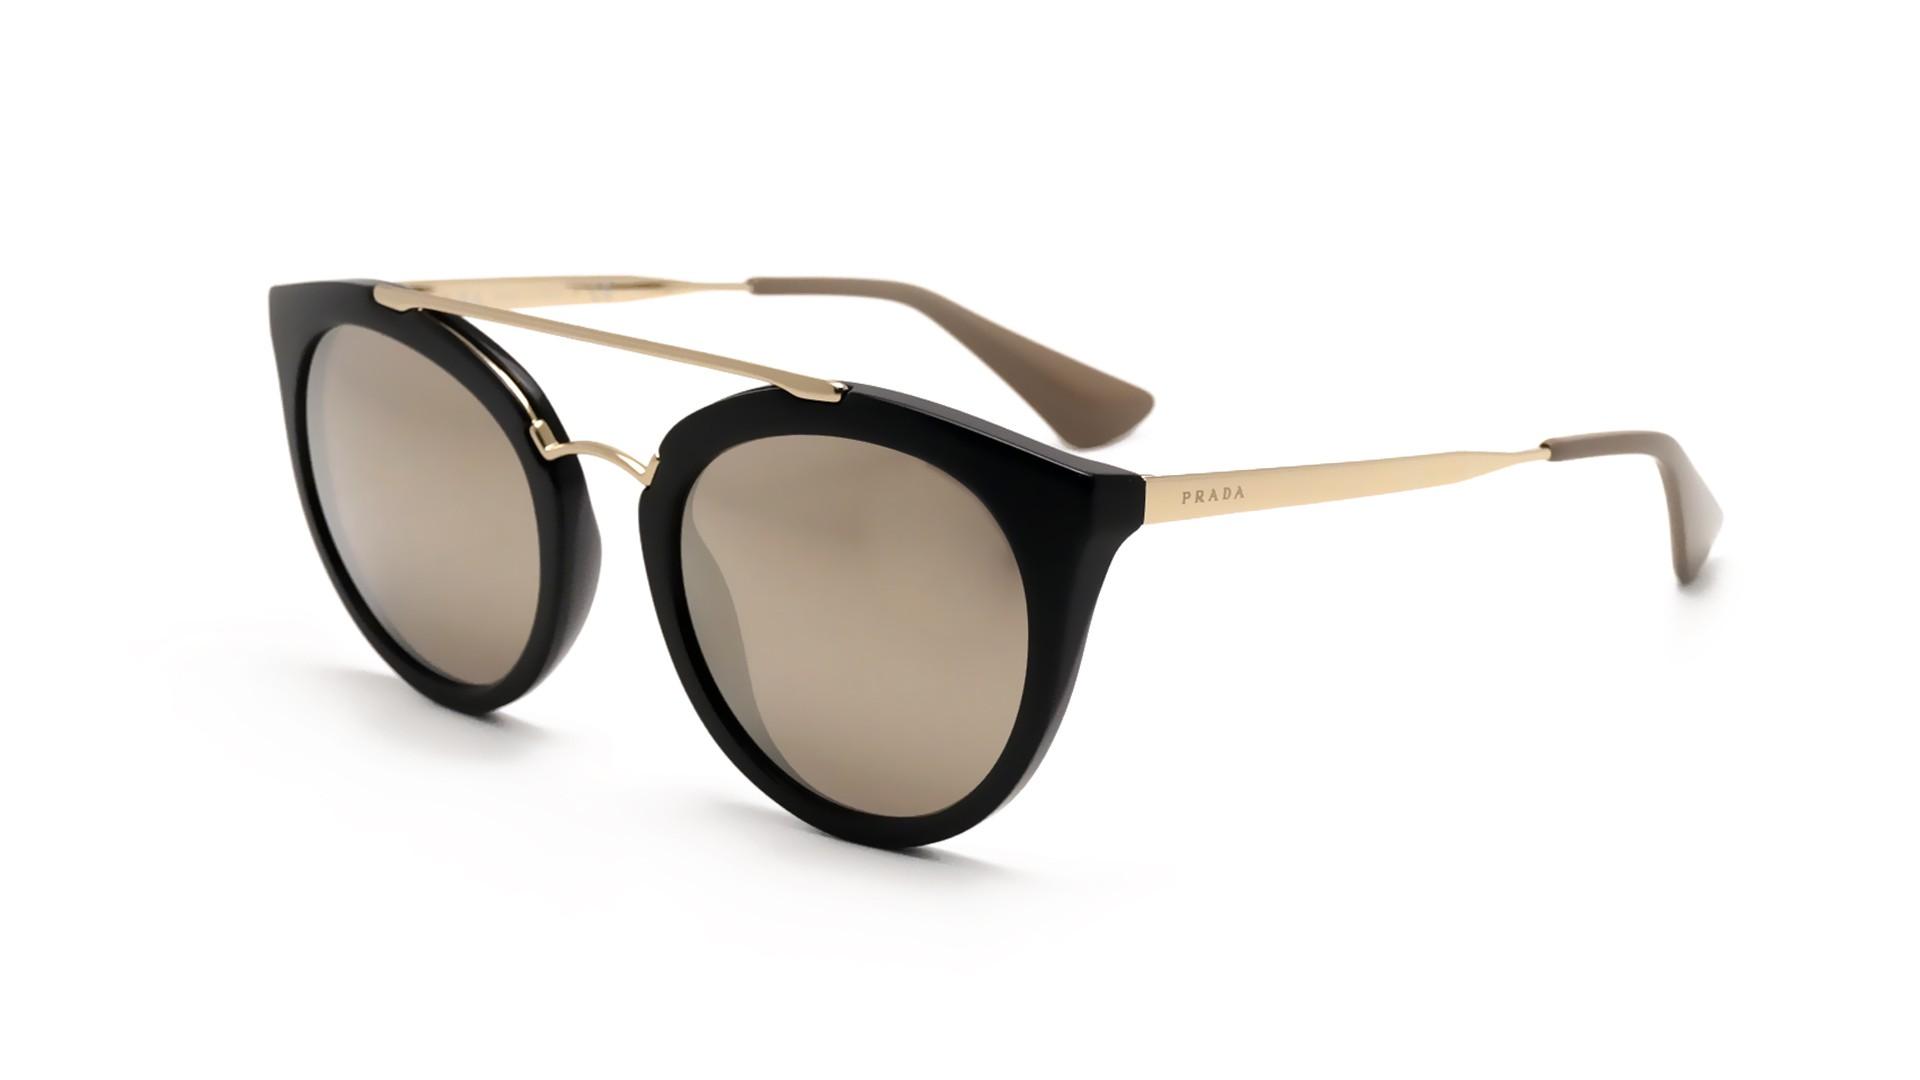 Sunglasses Prada PR23SS 1AB1C0 52-22 Black Medium Mirror be75bae903